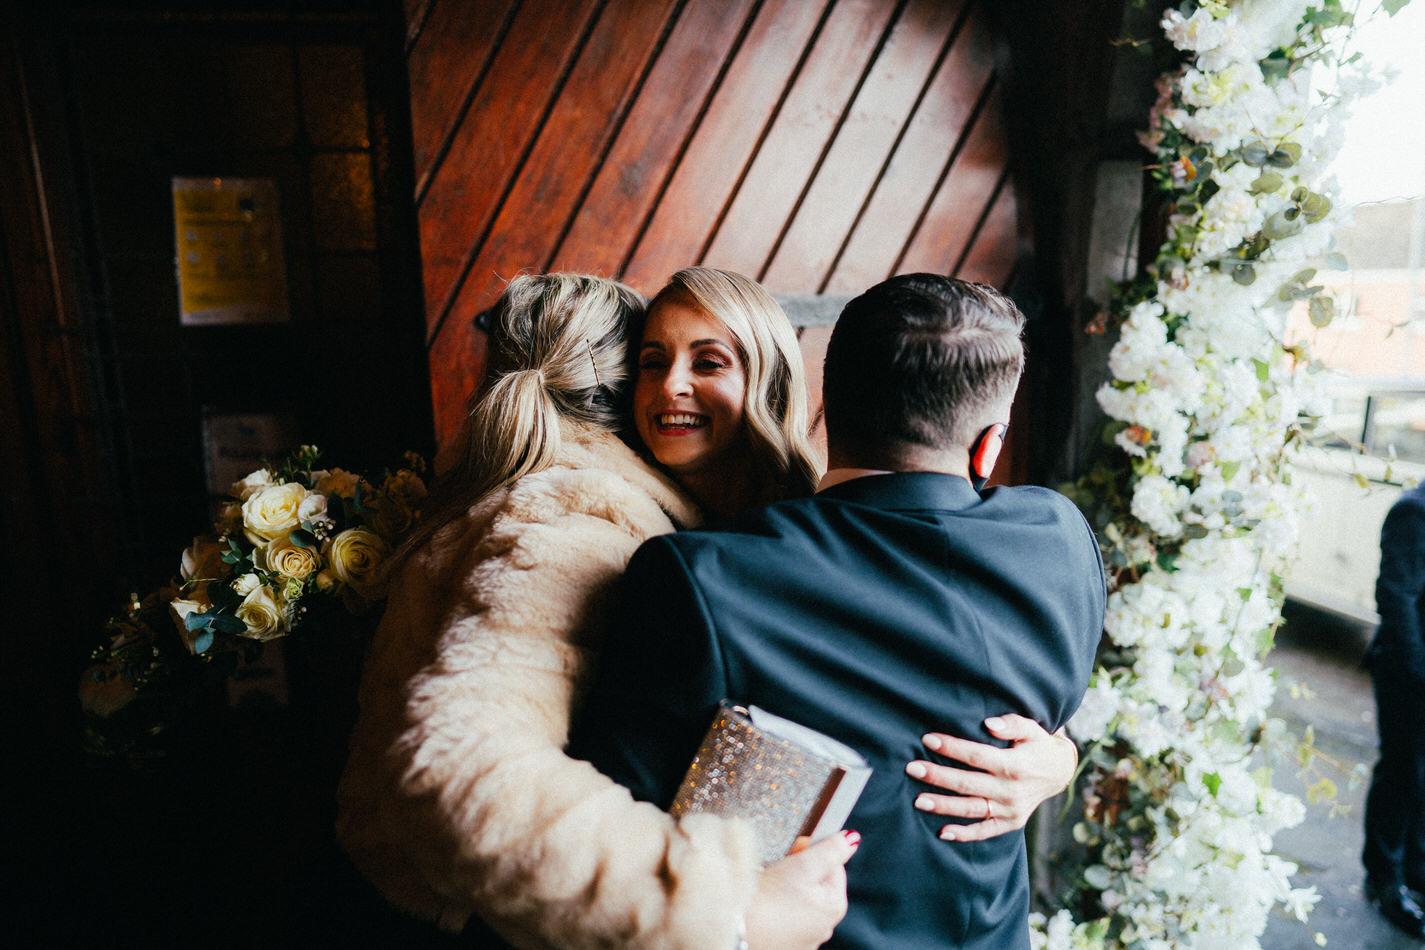 Castle-wedding-ireland-photos- 0159 111